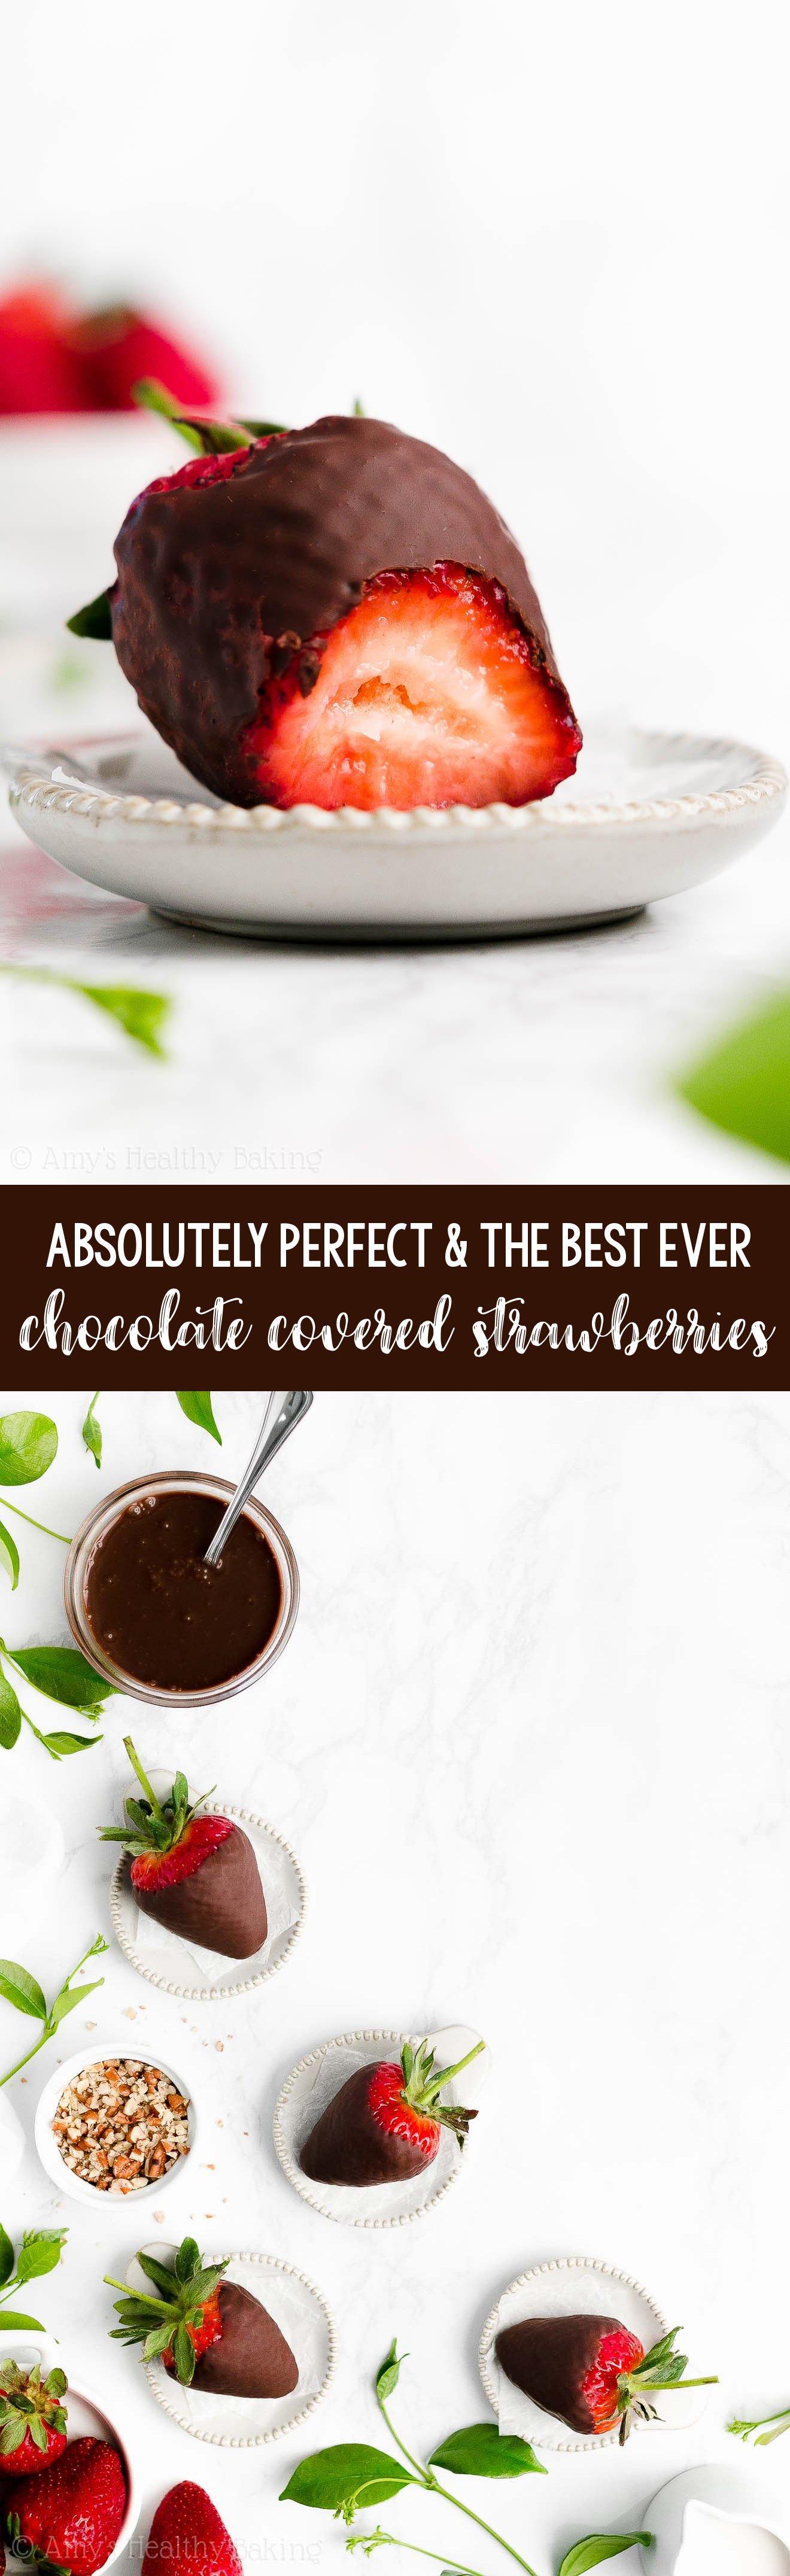 Perfect, BEST EVER Healthy Homemade DIY Vegan Dark Chocolate Covered Strawberries